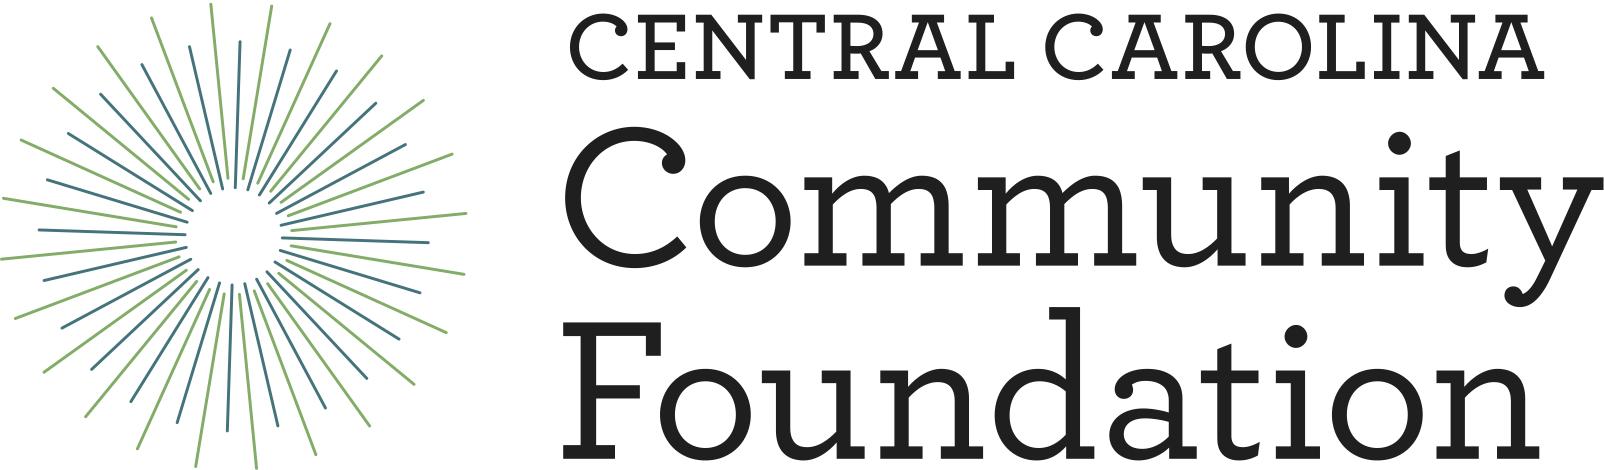 Central Carolina Community Foundation Logo.png